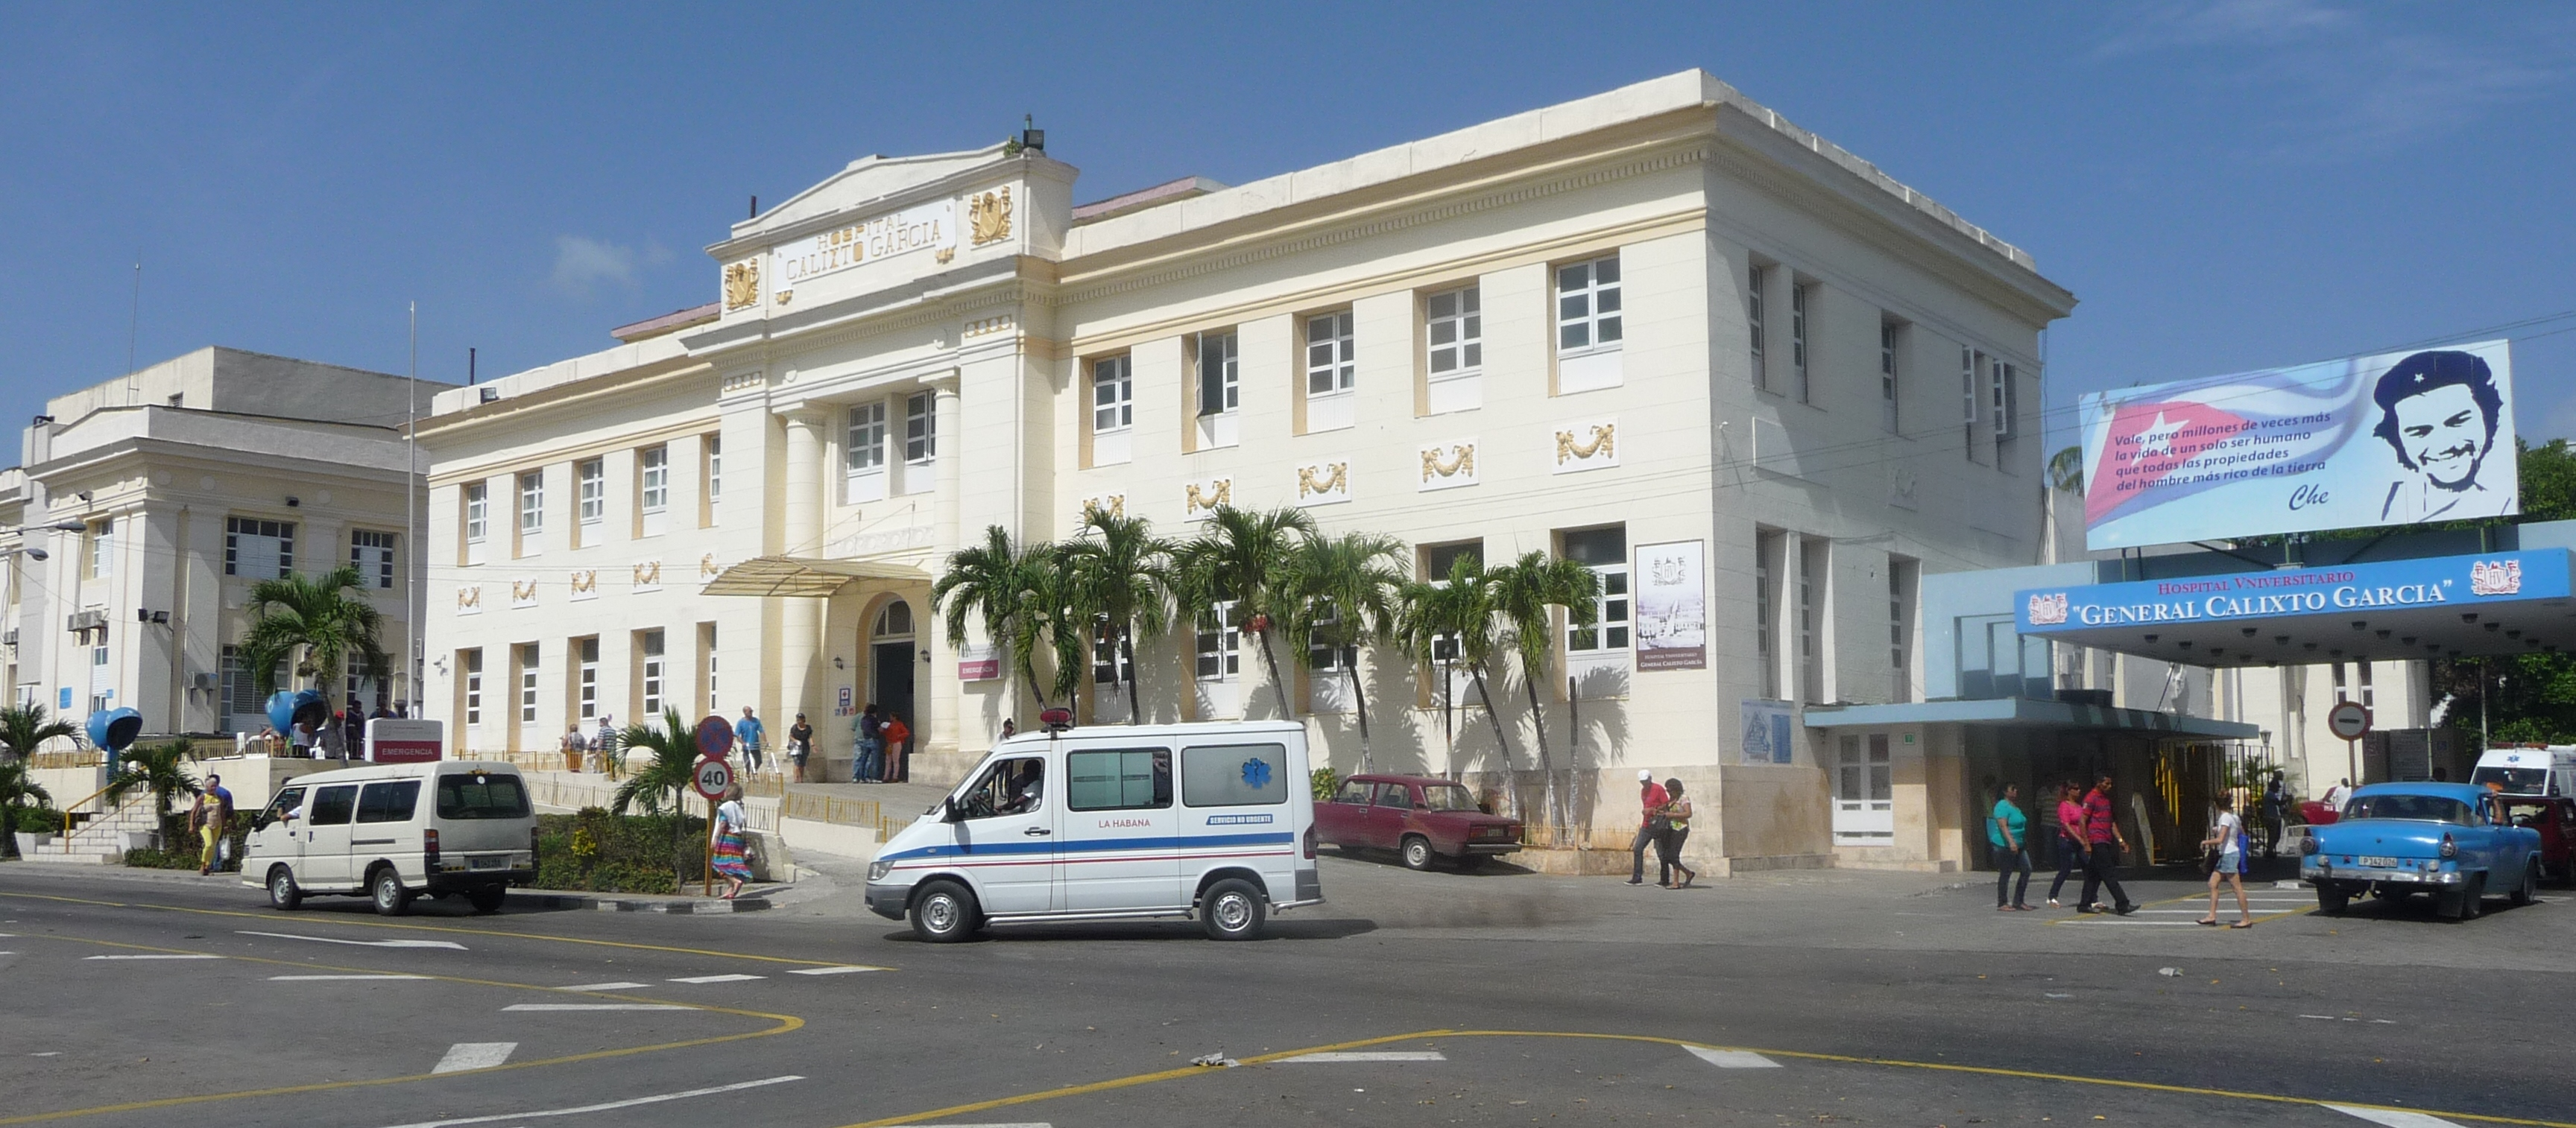 General Calixto Hospital, Havana